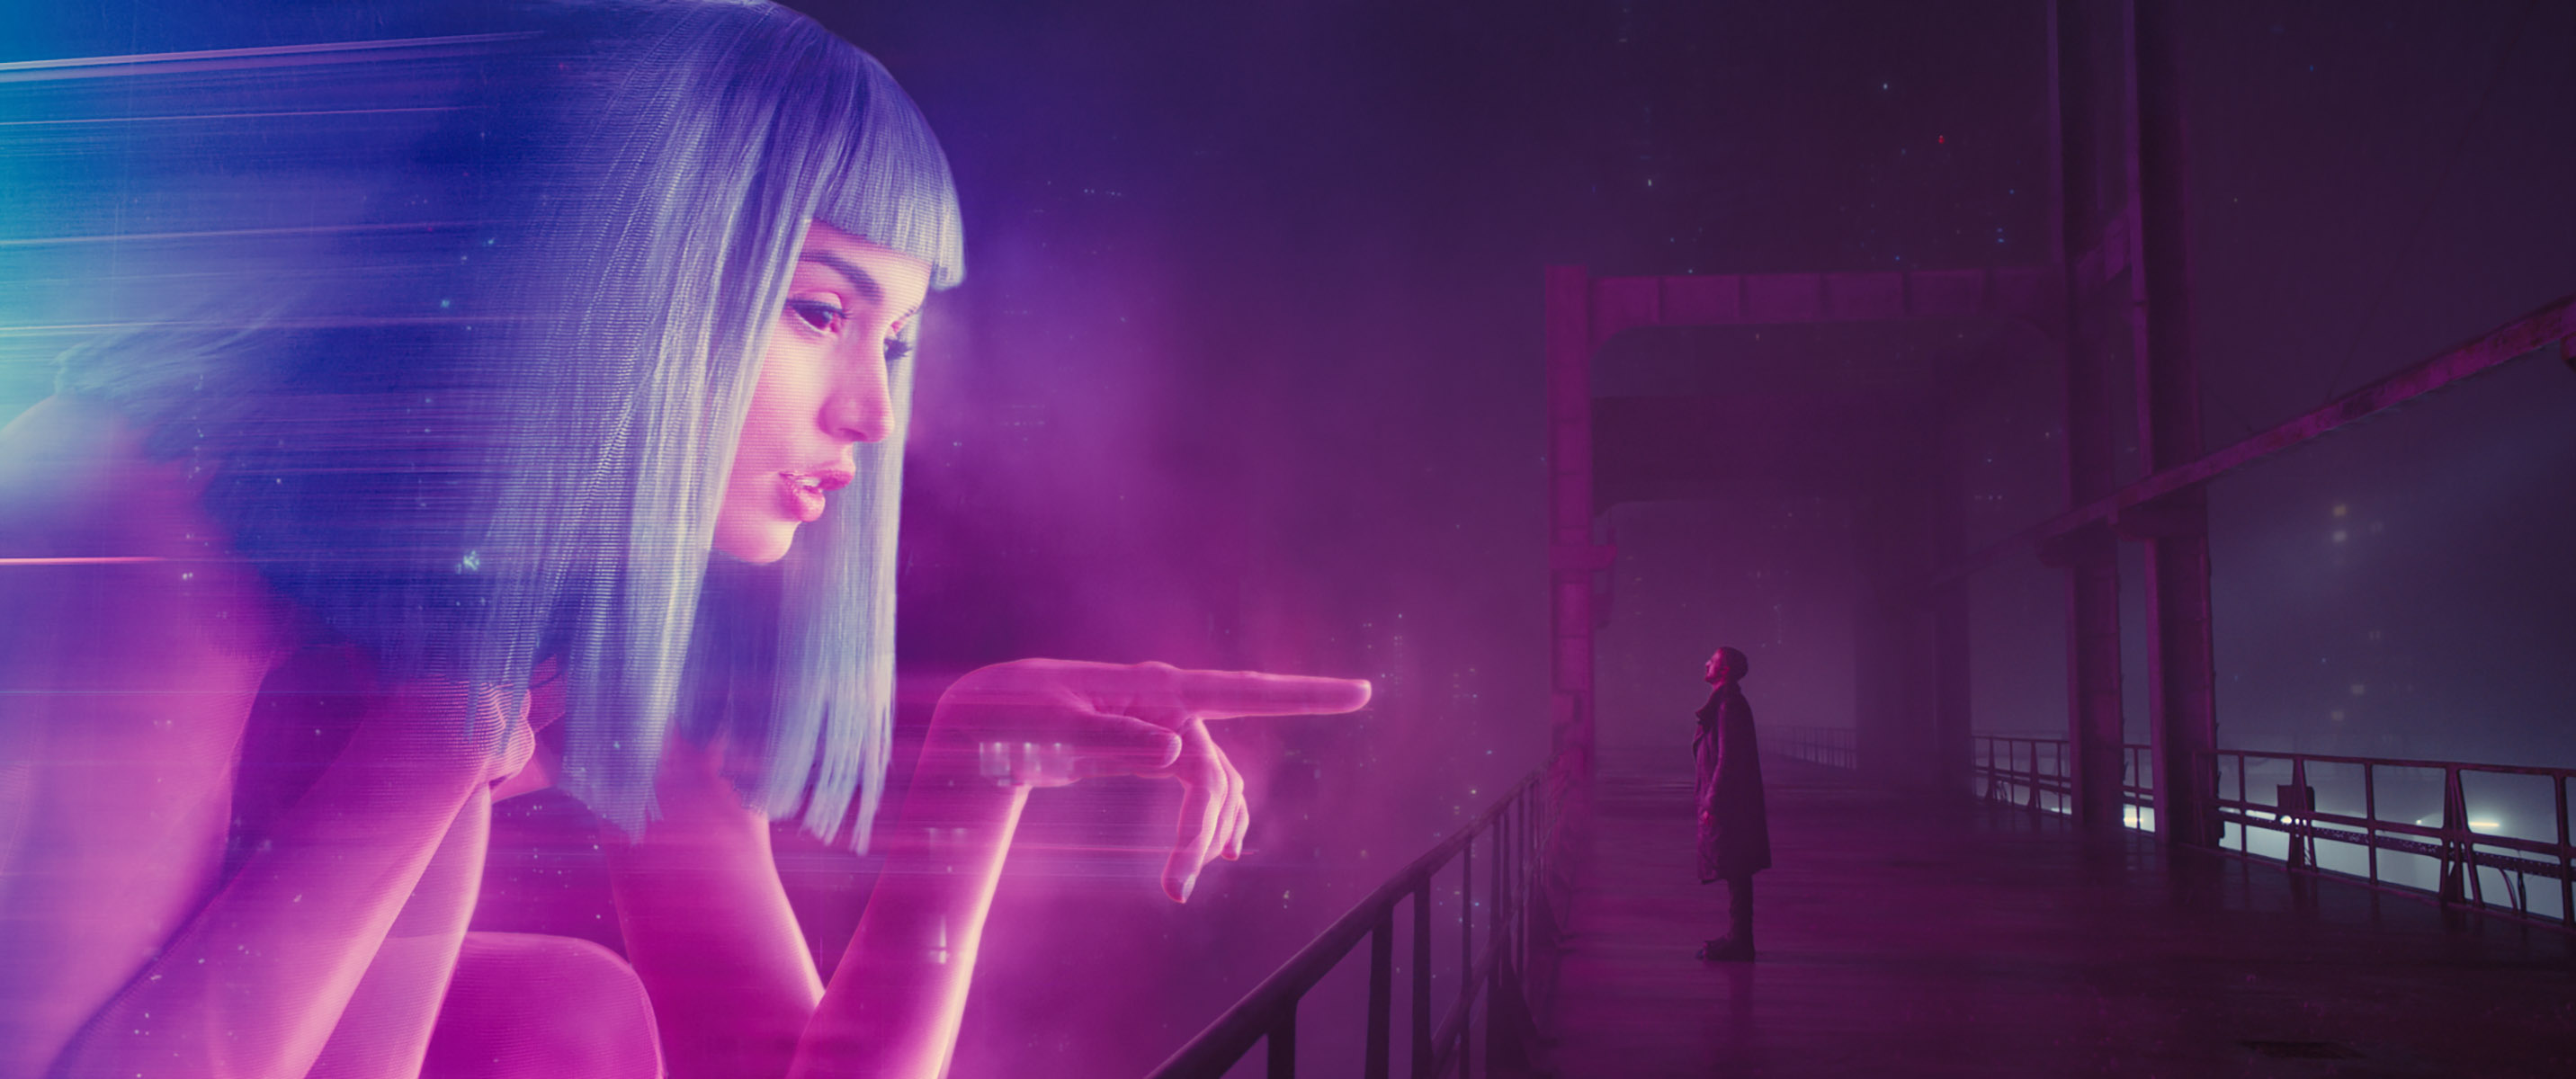 6 Ways That Blade Runner 2049 Improves Upon The Original